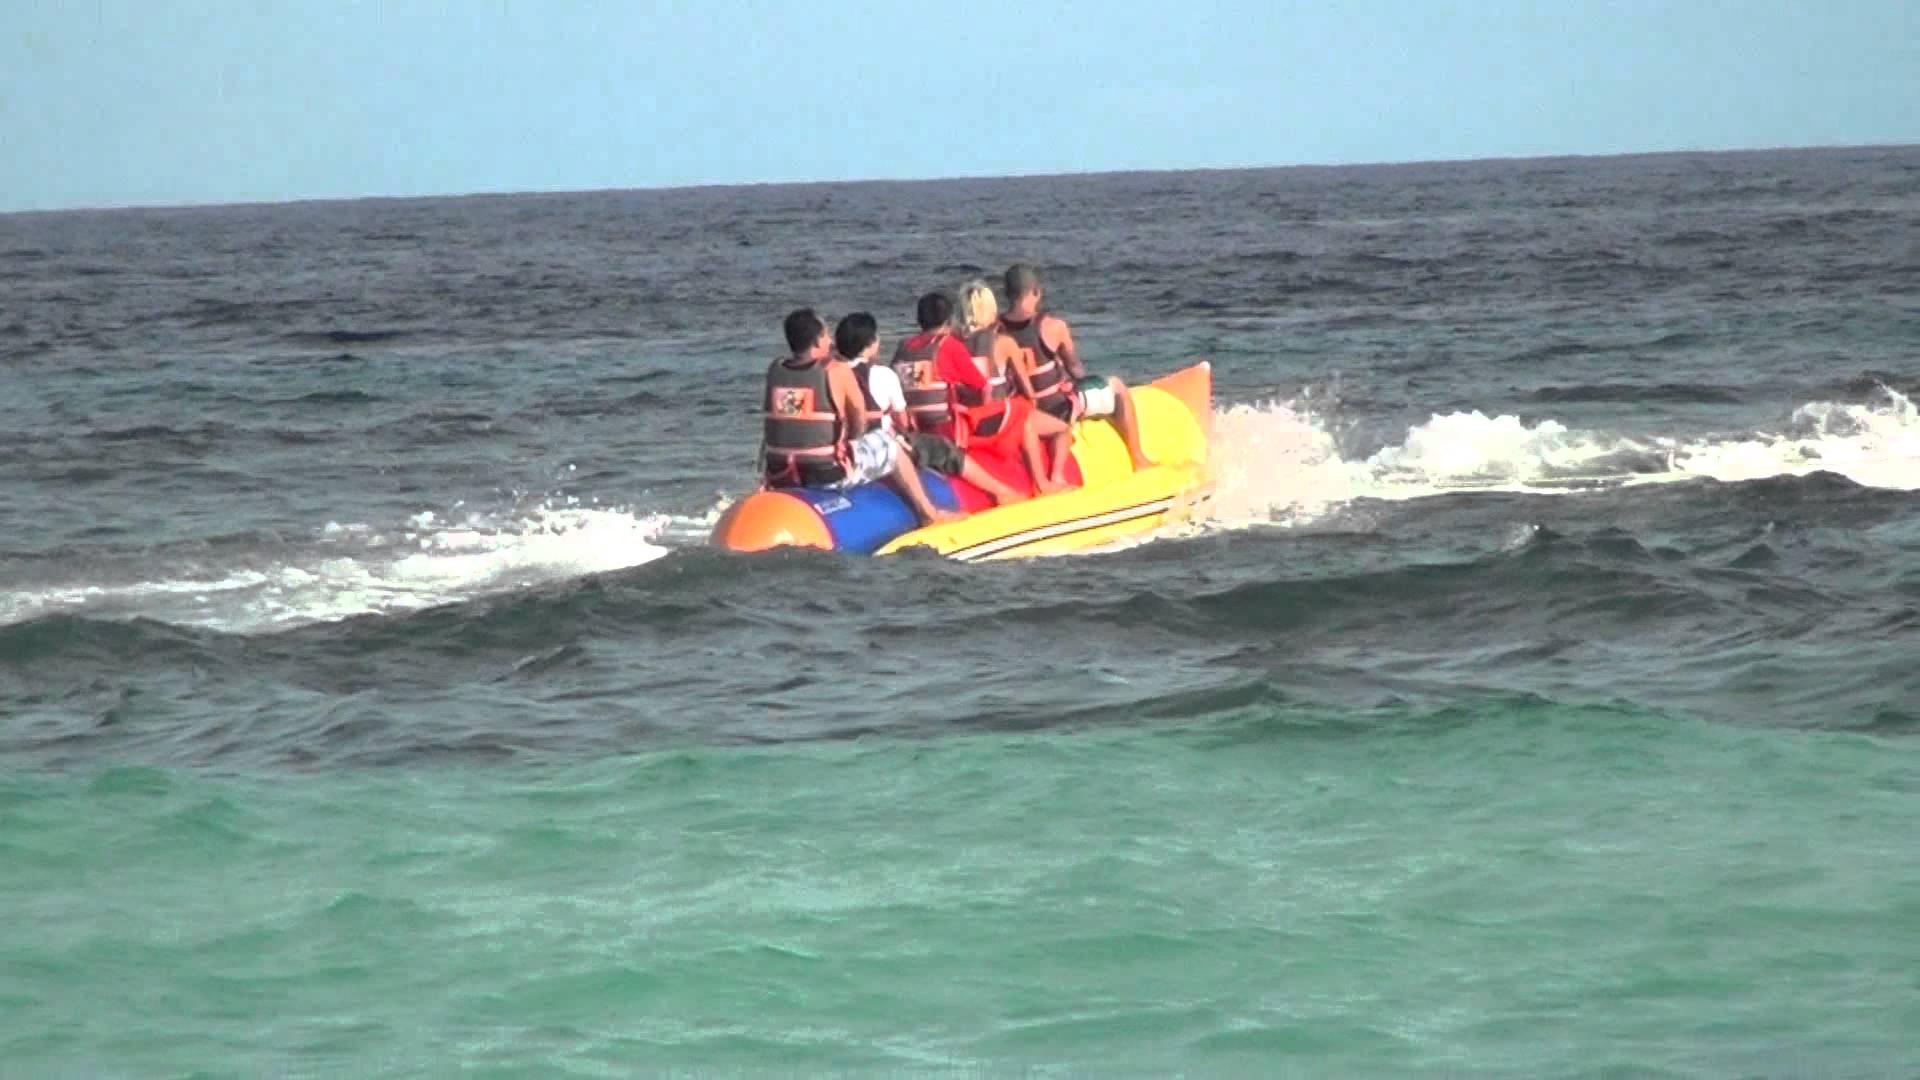 Boat ride photo